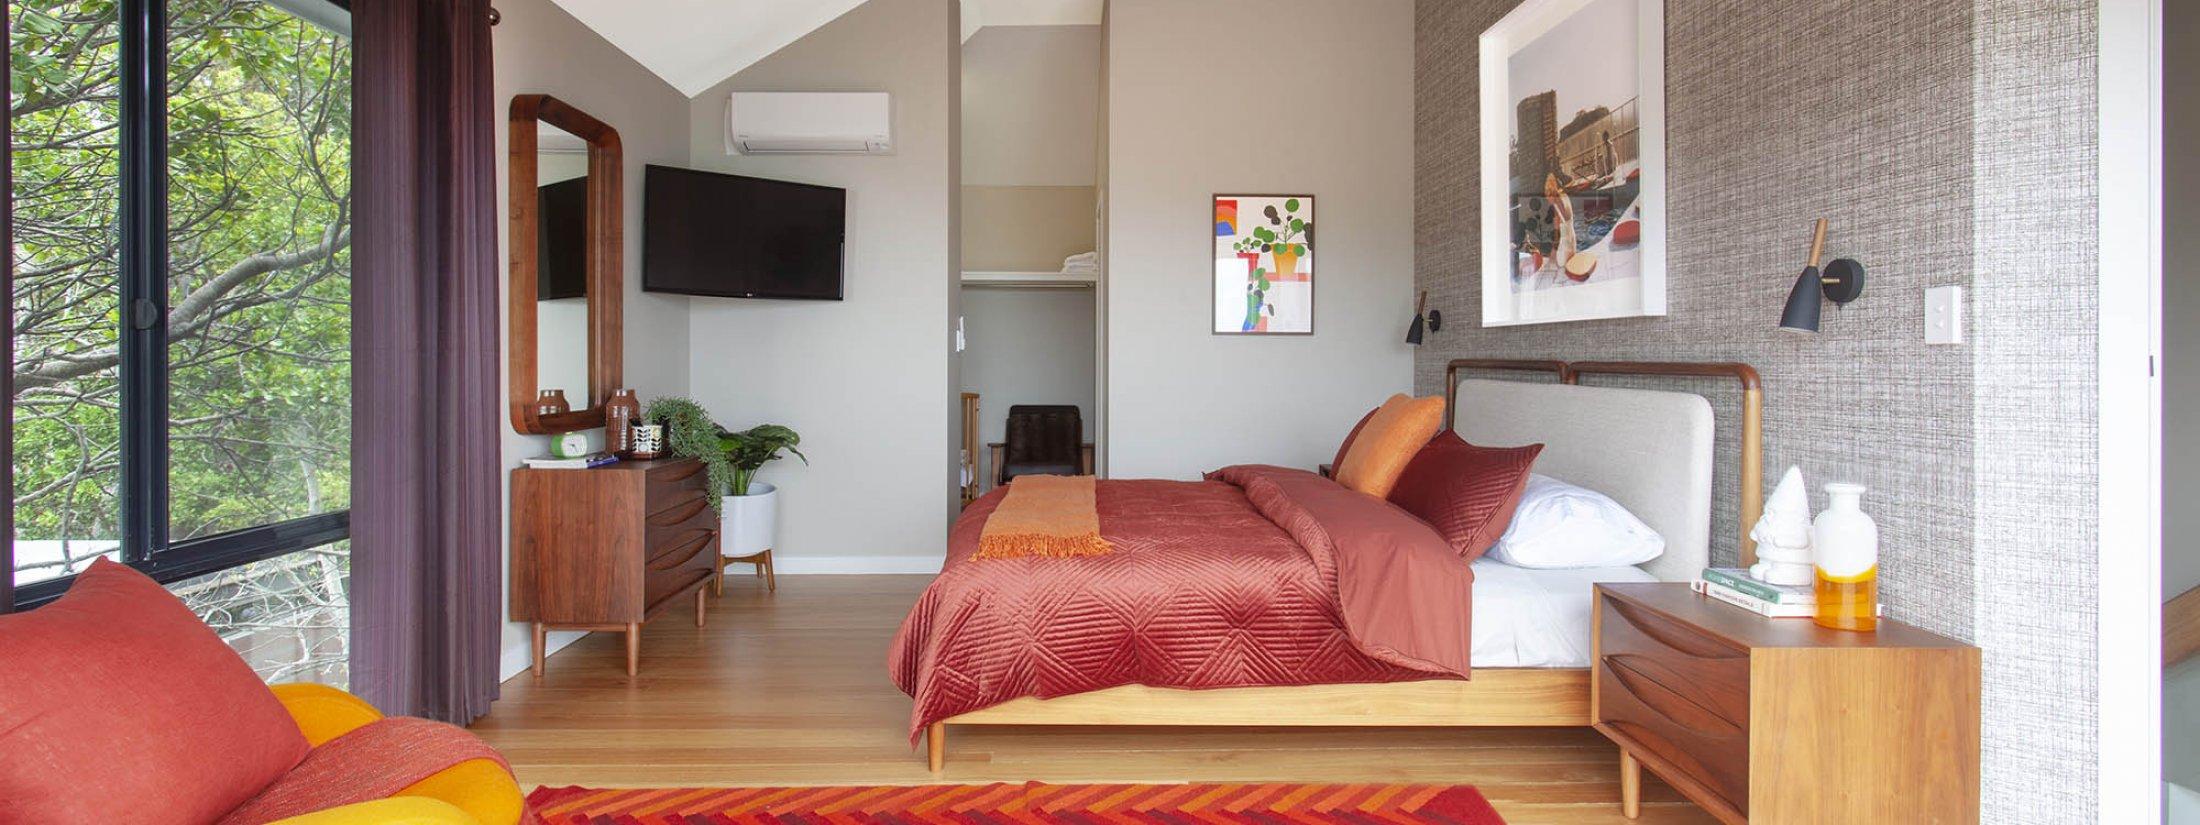 The Palms at Byron - Byron Bay - Bedroom 2